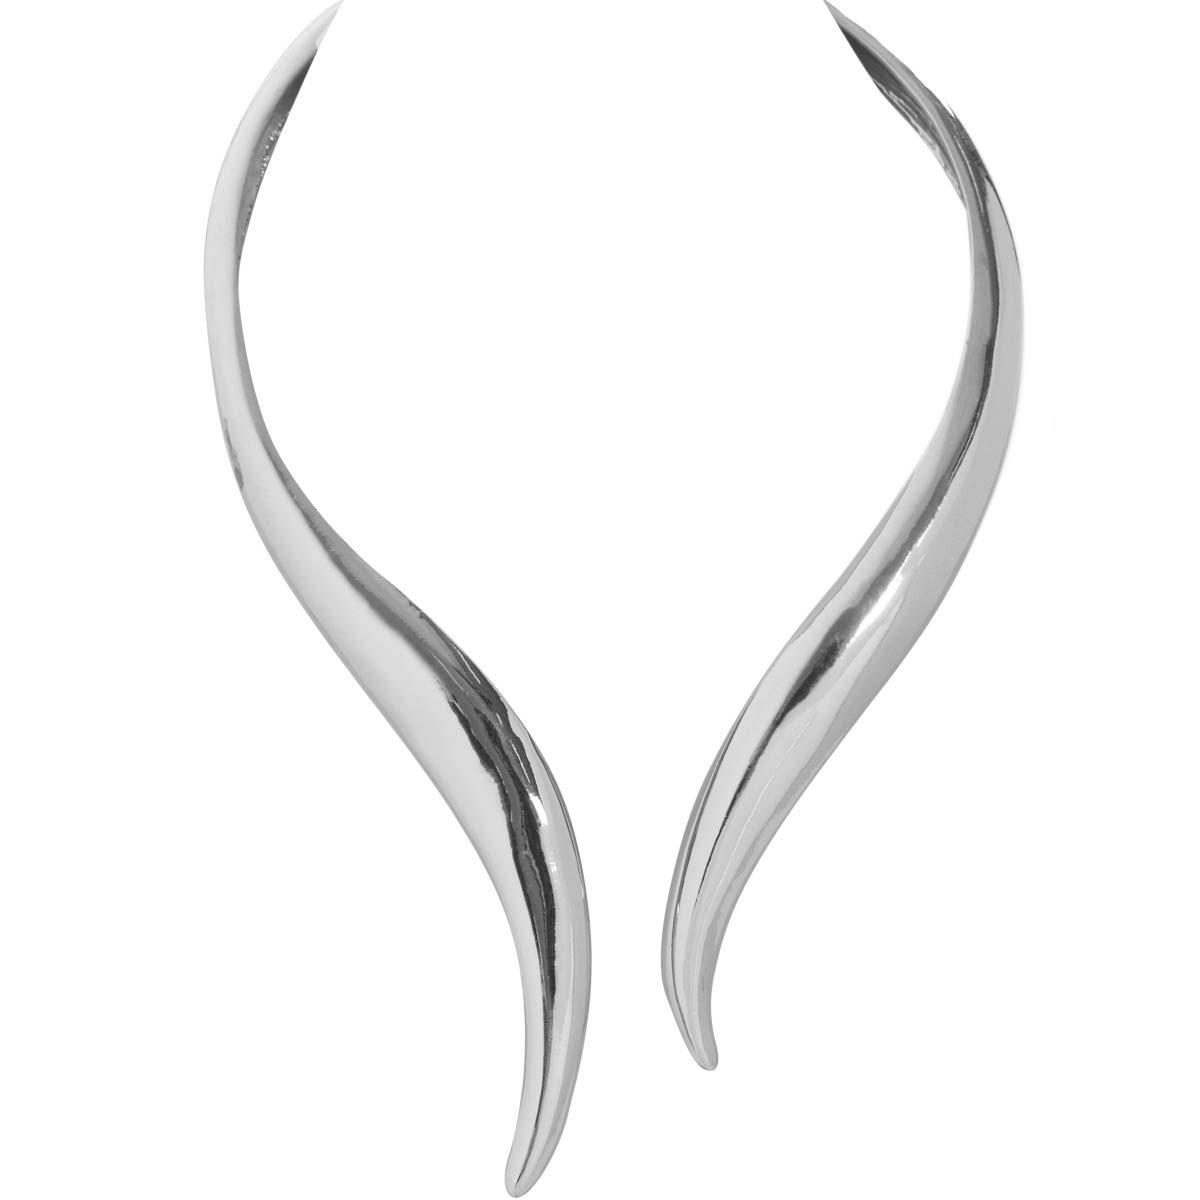 Humble Chic Hinge Bib Necklace - Oversized Asymmetrical Statement Collar Open Choker, Silver-Tone, Metallic White